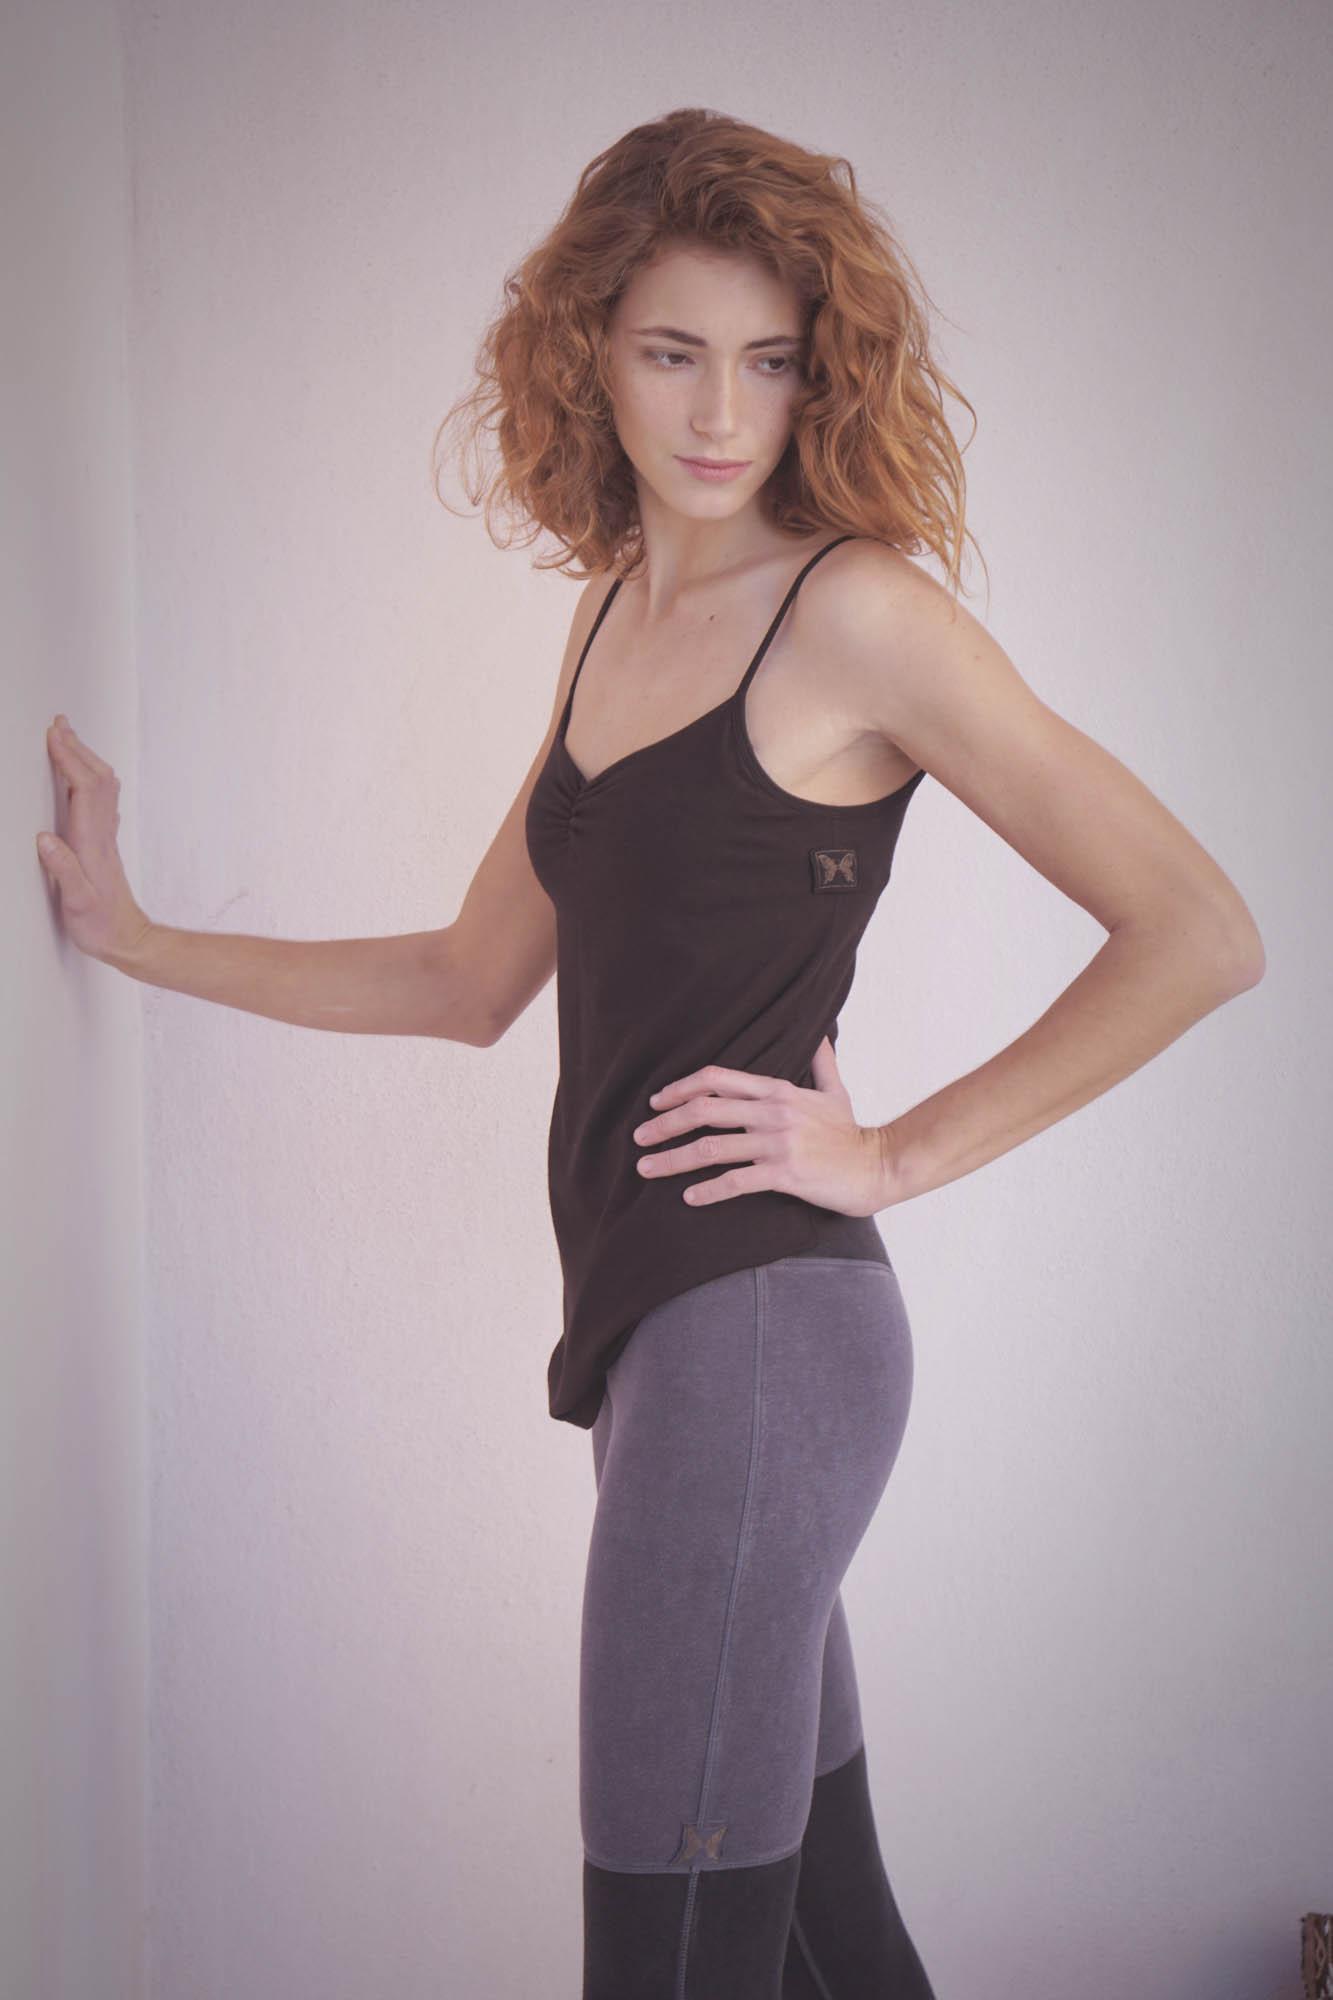 Maria Malo active wear organic clothing